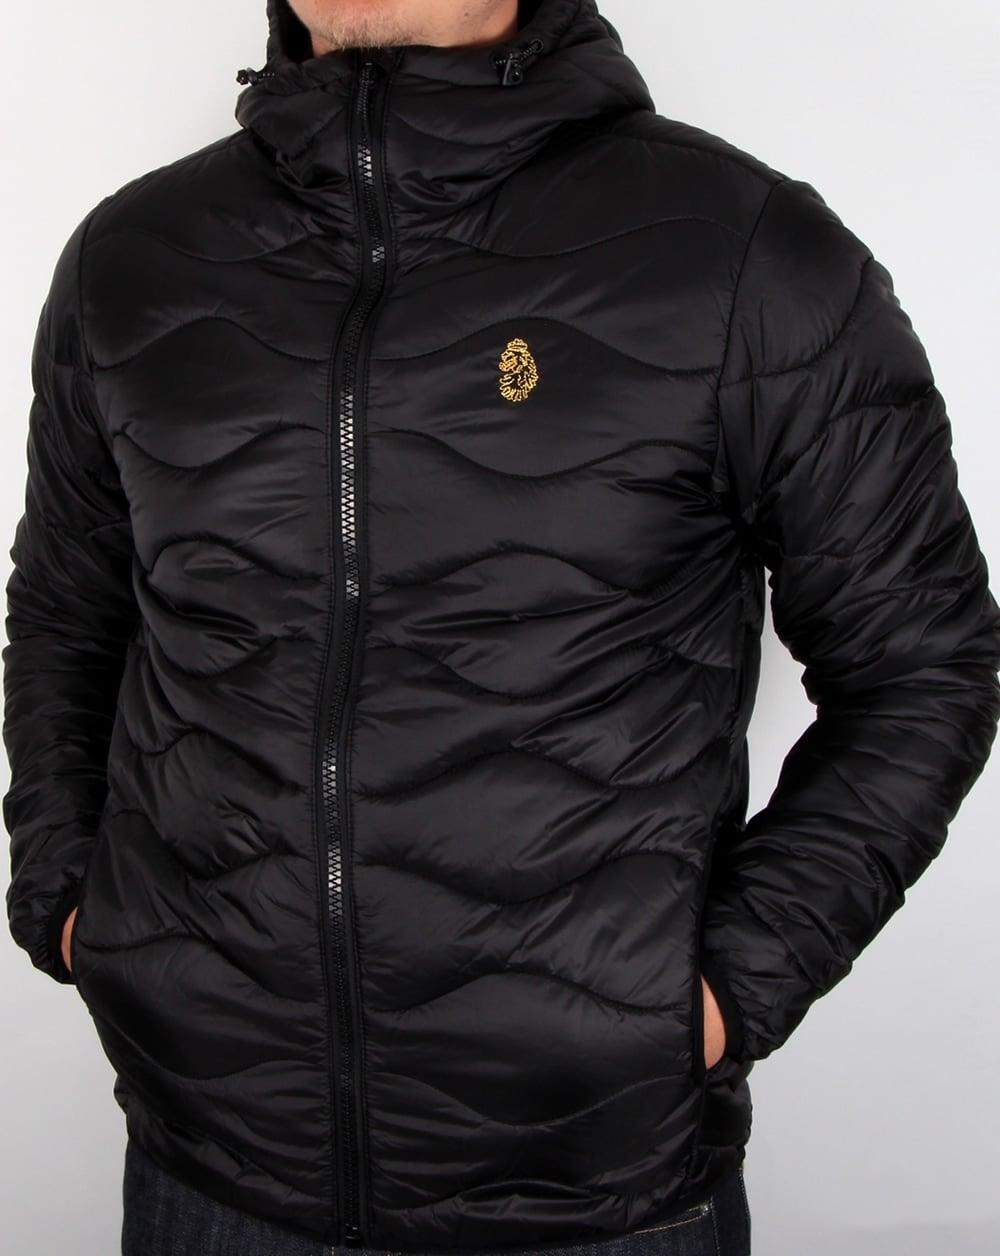 Luke Rubery Quilted Jacket Black Men S Coat Puffer Puffa